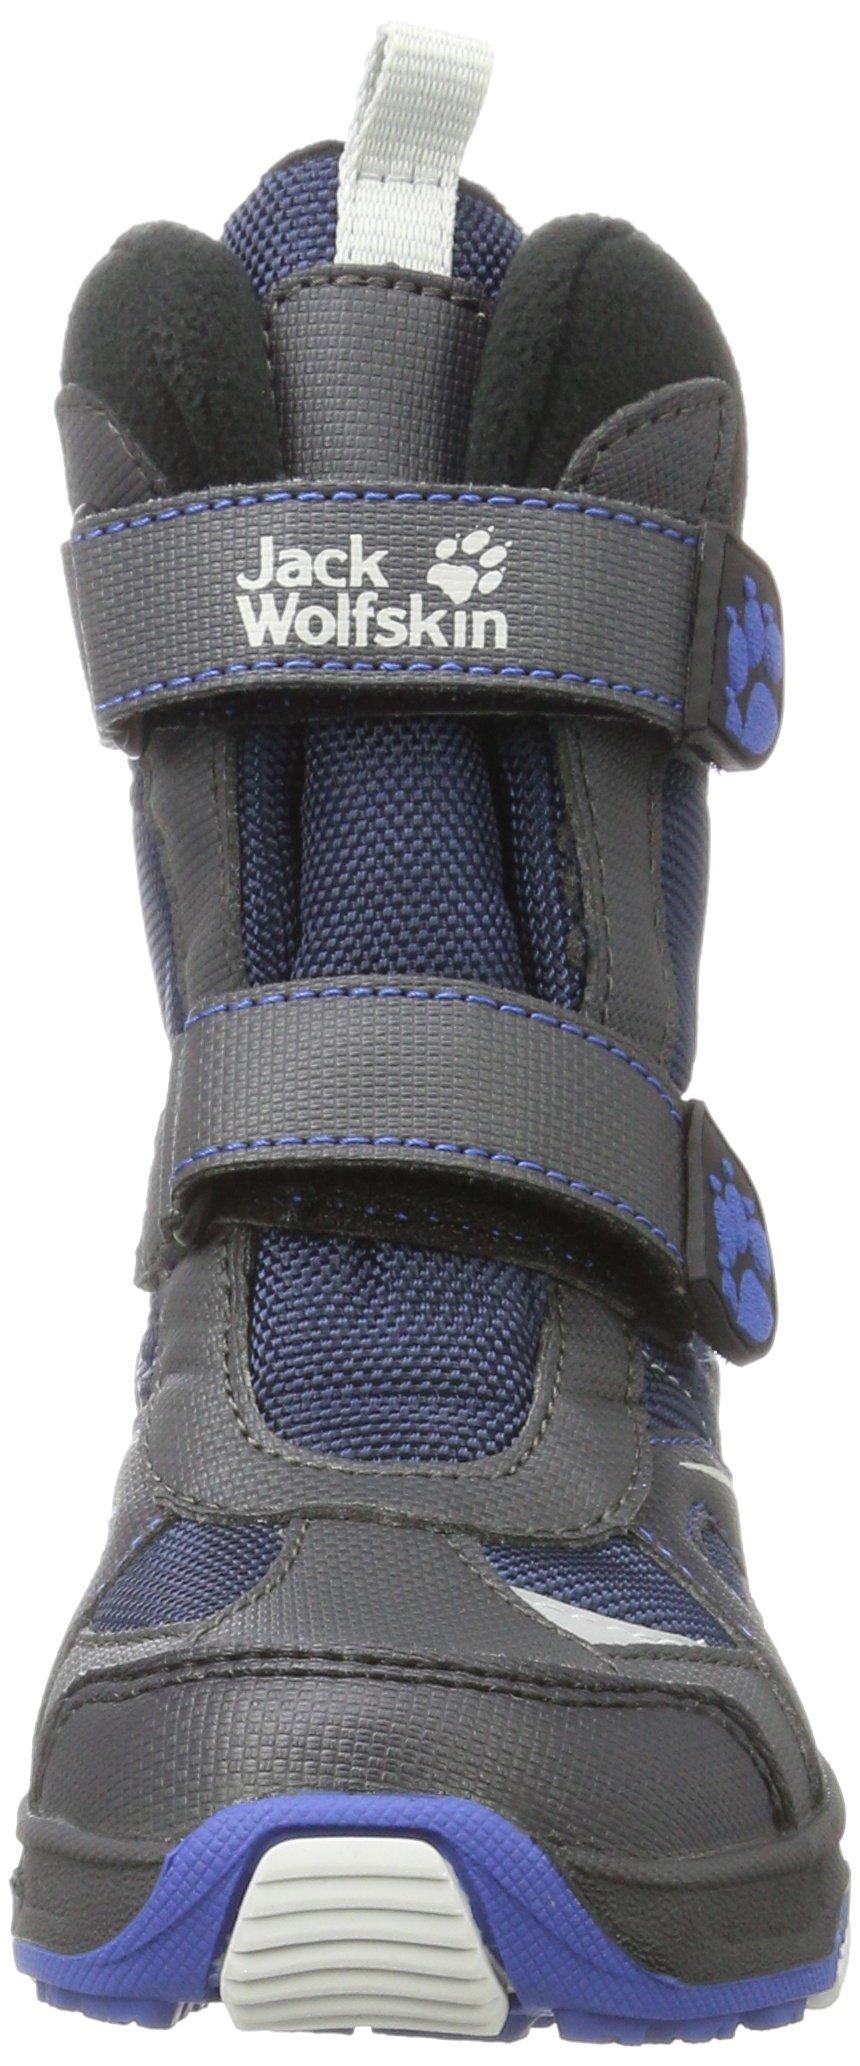 Jack Wolfskin Boy's S Polar Bear Texapore Snow Boots Child 4